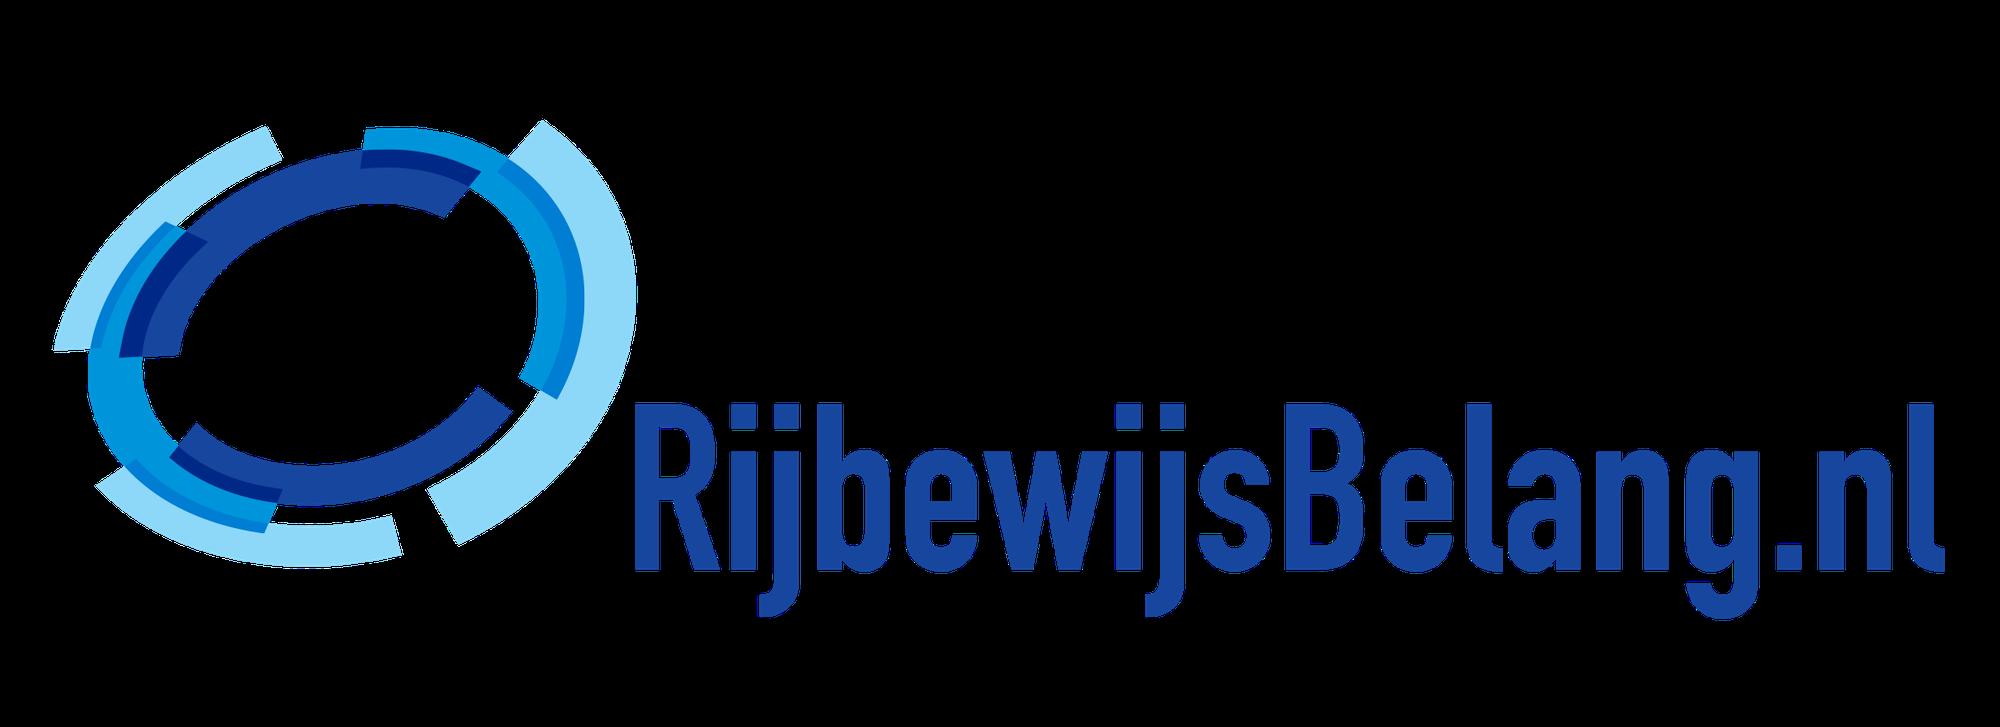 logo_rijbewijsbelang_1.png